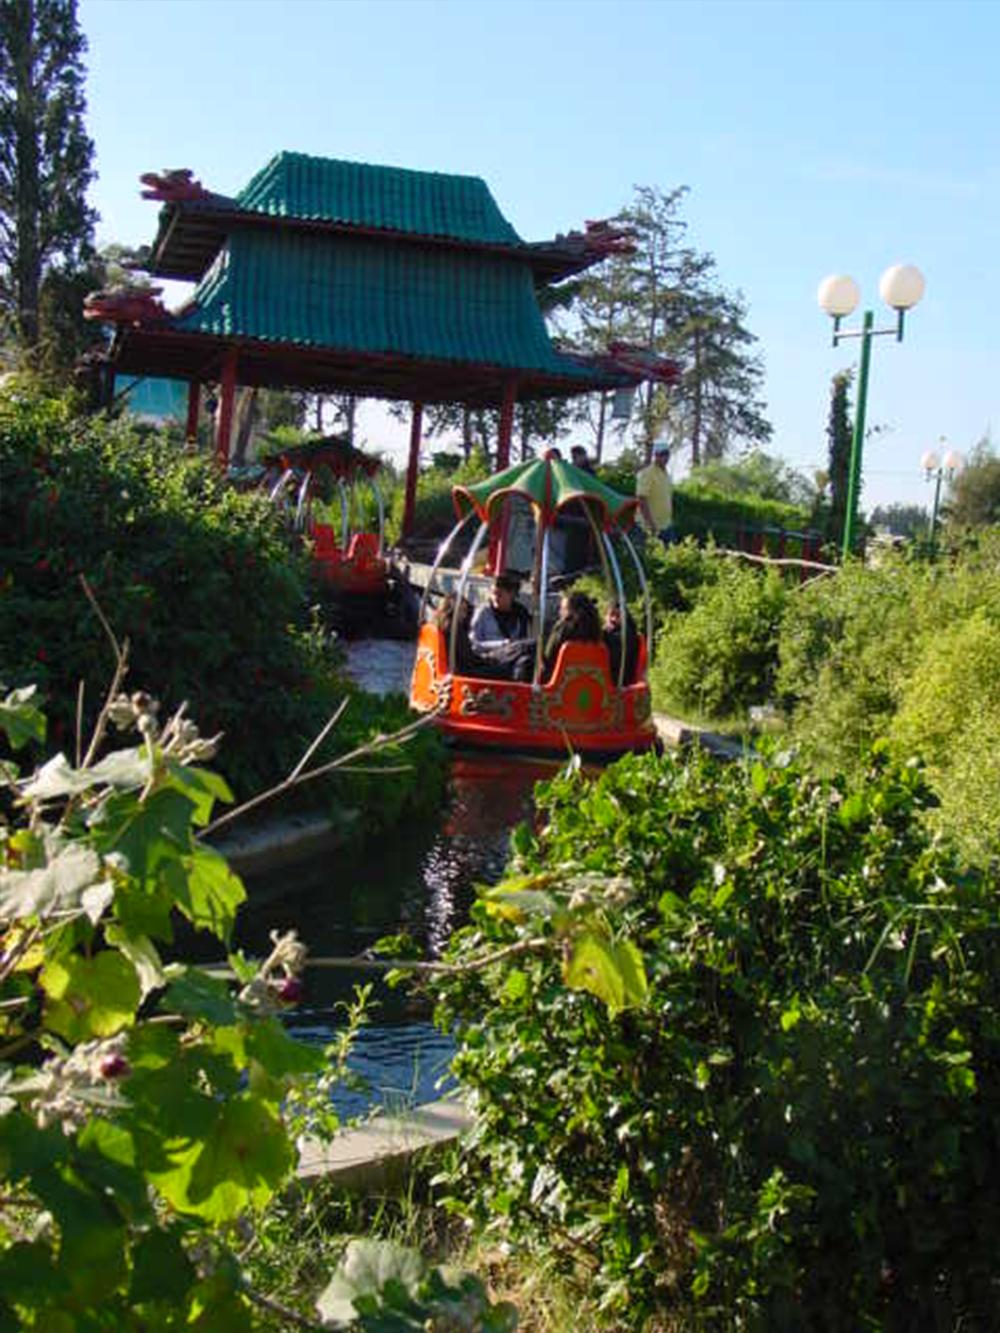 Interlink New Ride : Spin Boat La Riviere Enchantée at Hannibal Park Soukra 3